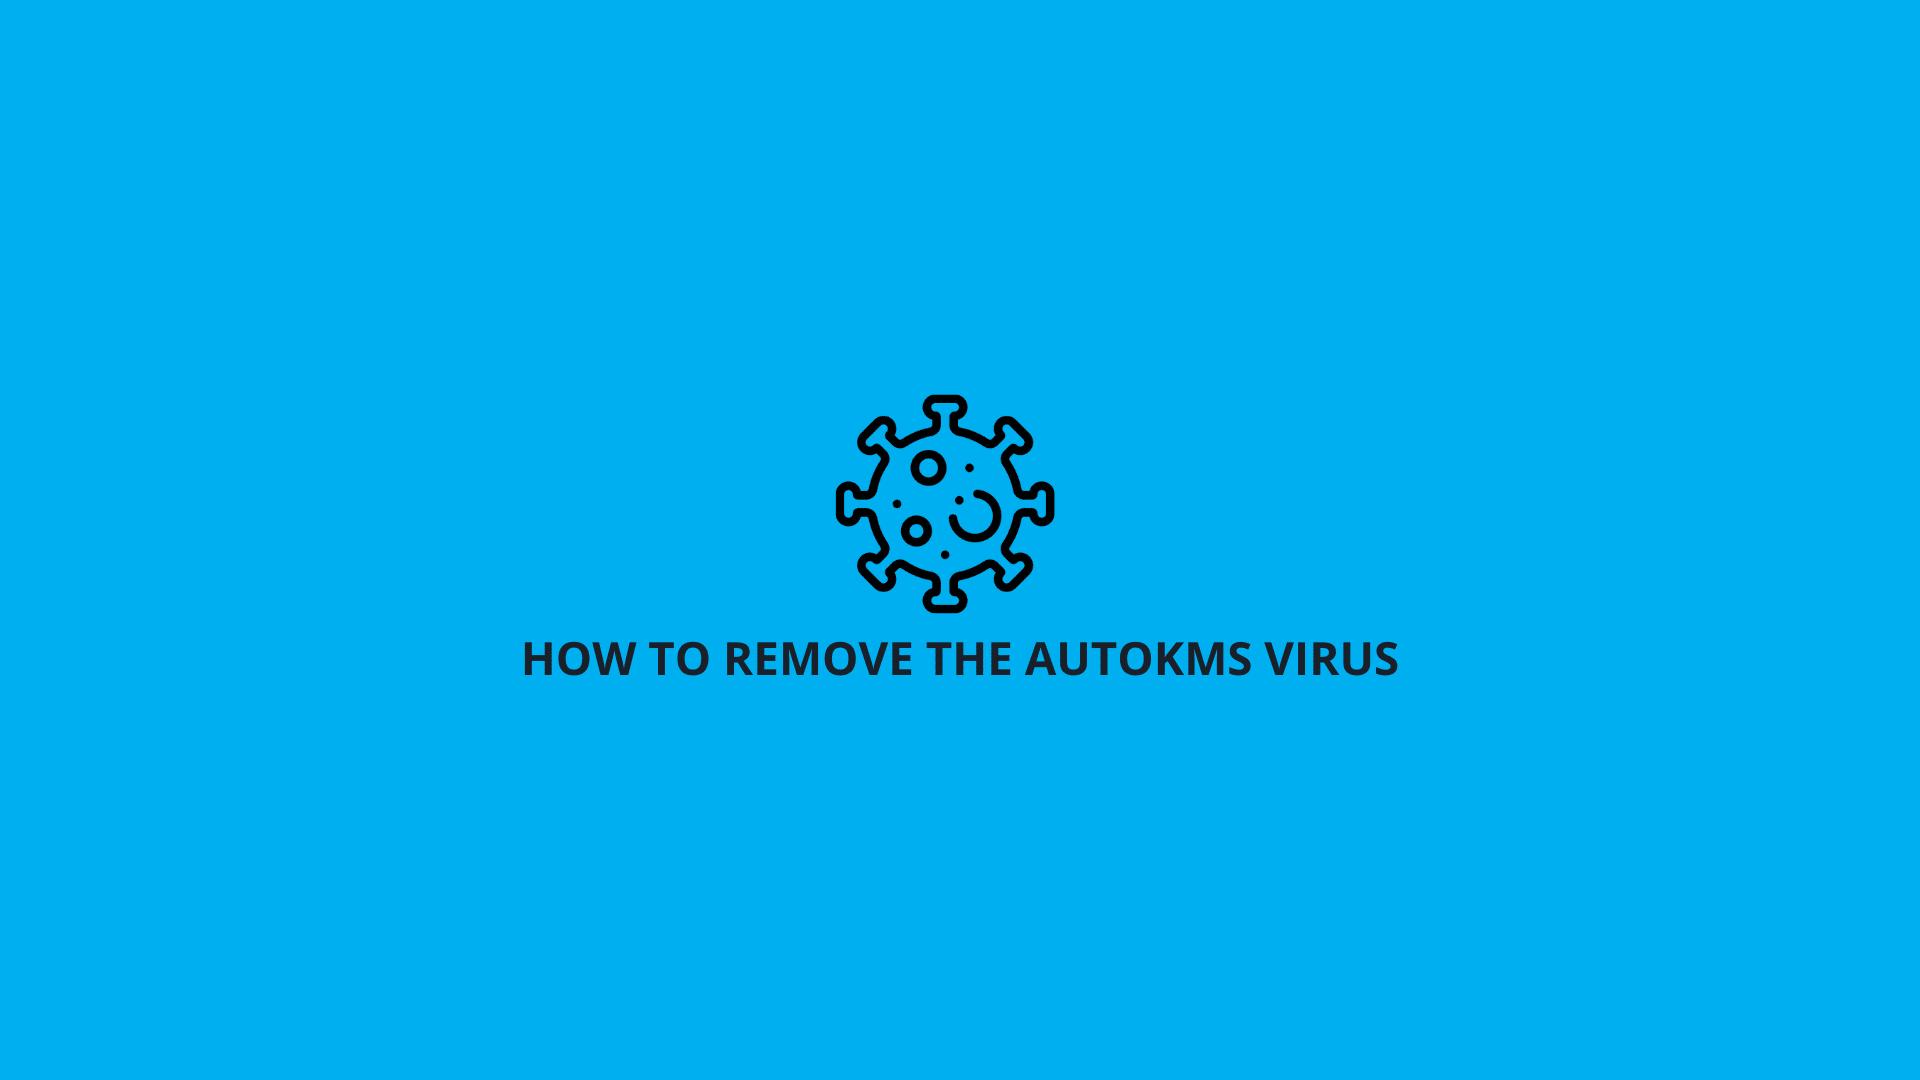 Remove the AutoKMS Virus